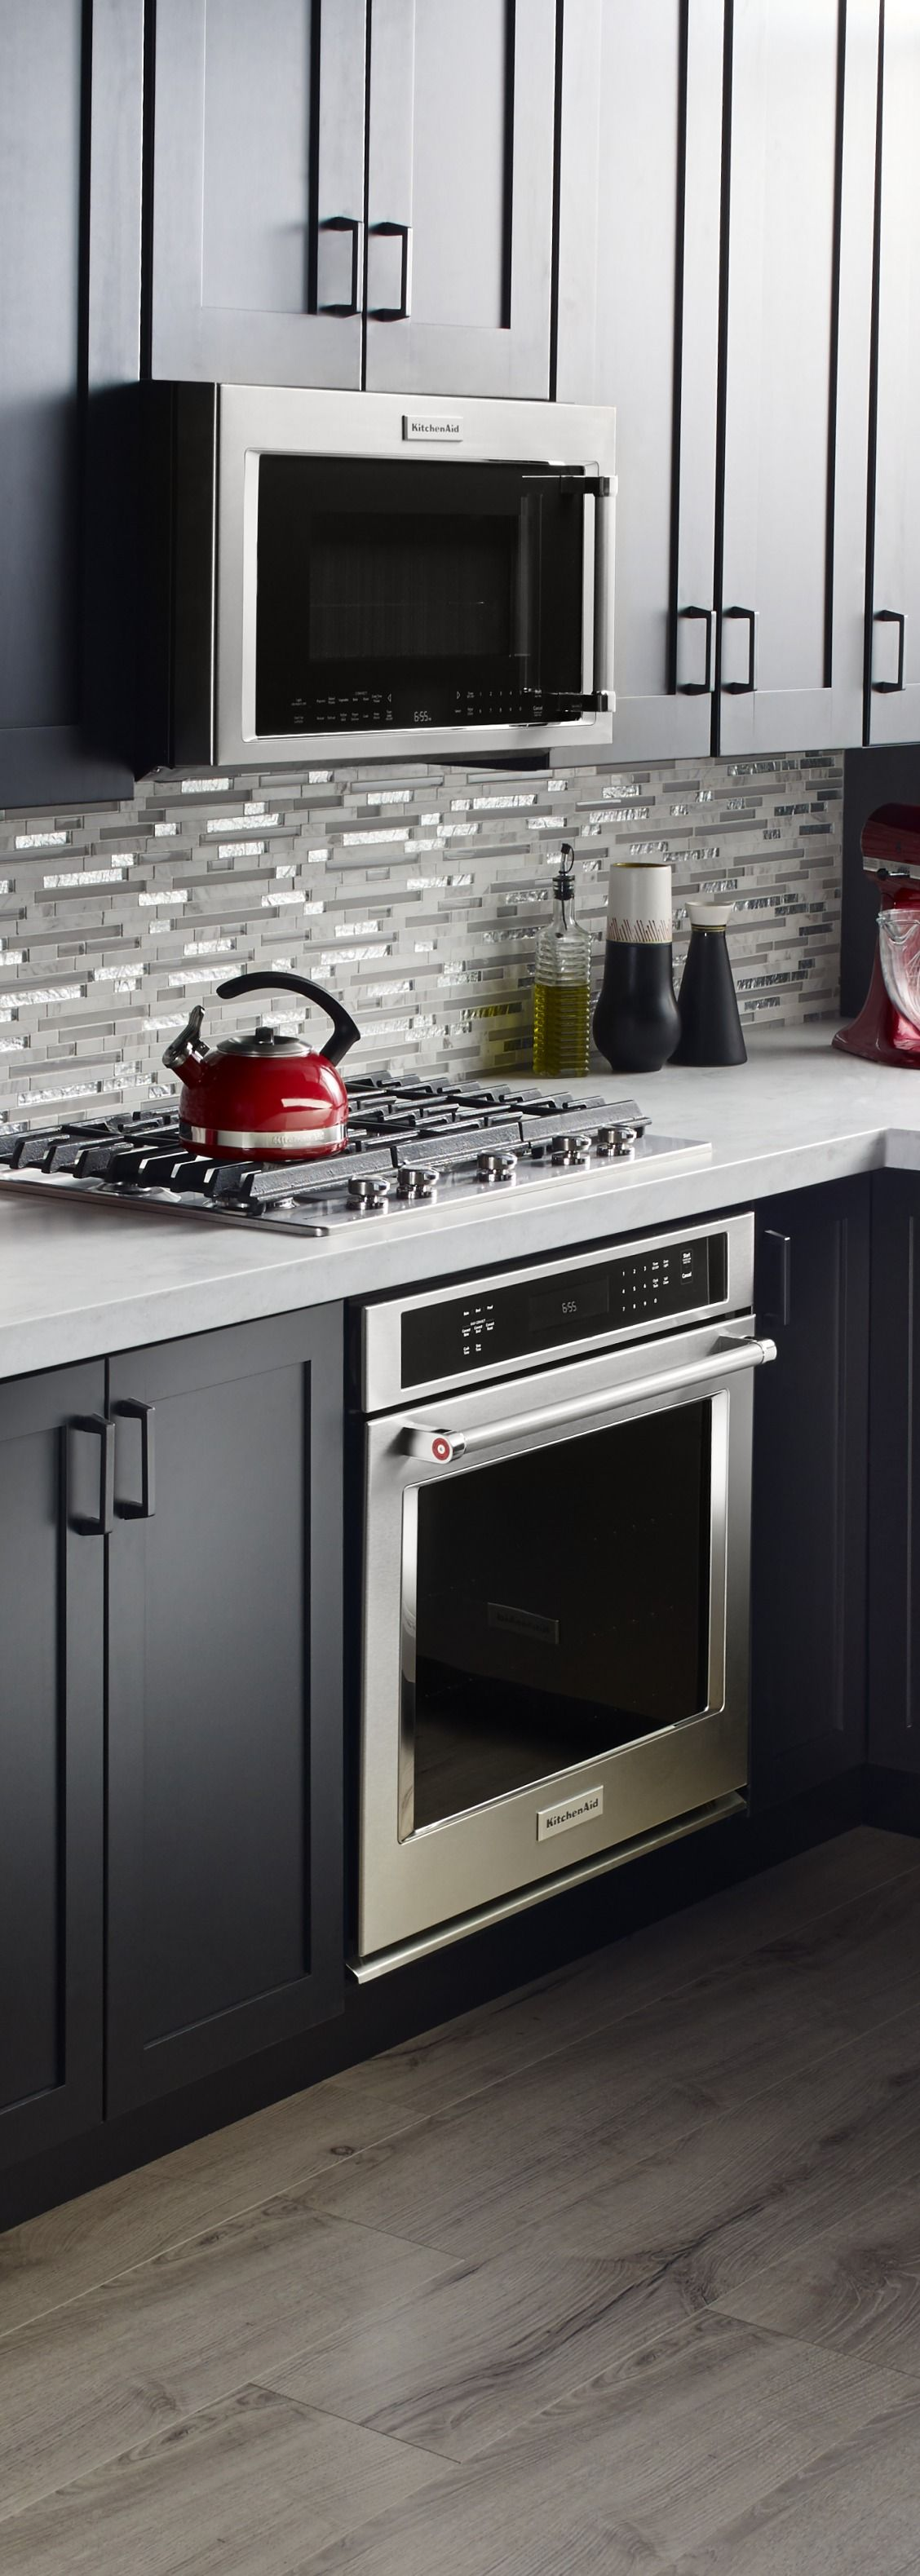 Nina Everyday Enchanting Diy Painted Oak Kitchen Cabinets Review